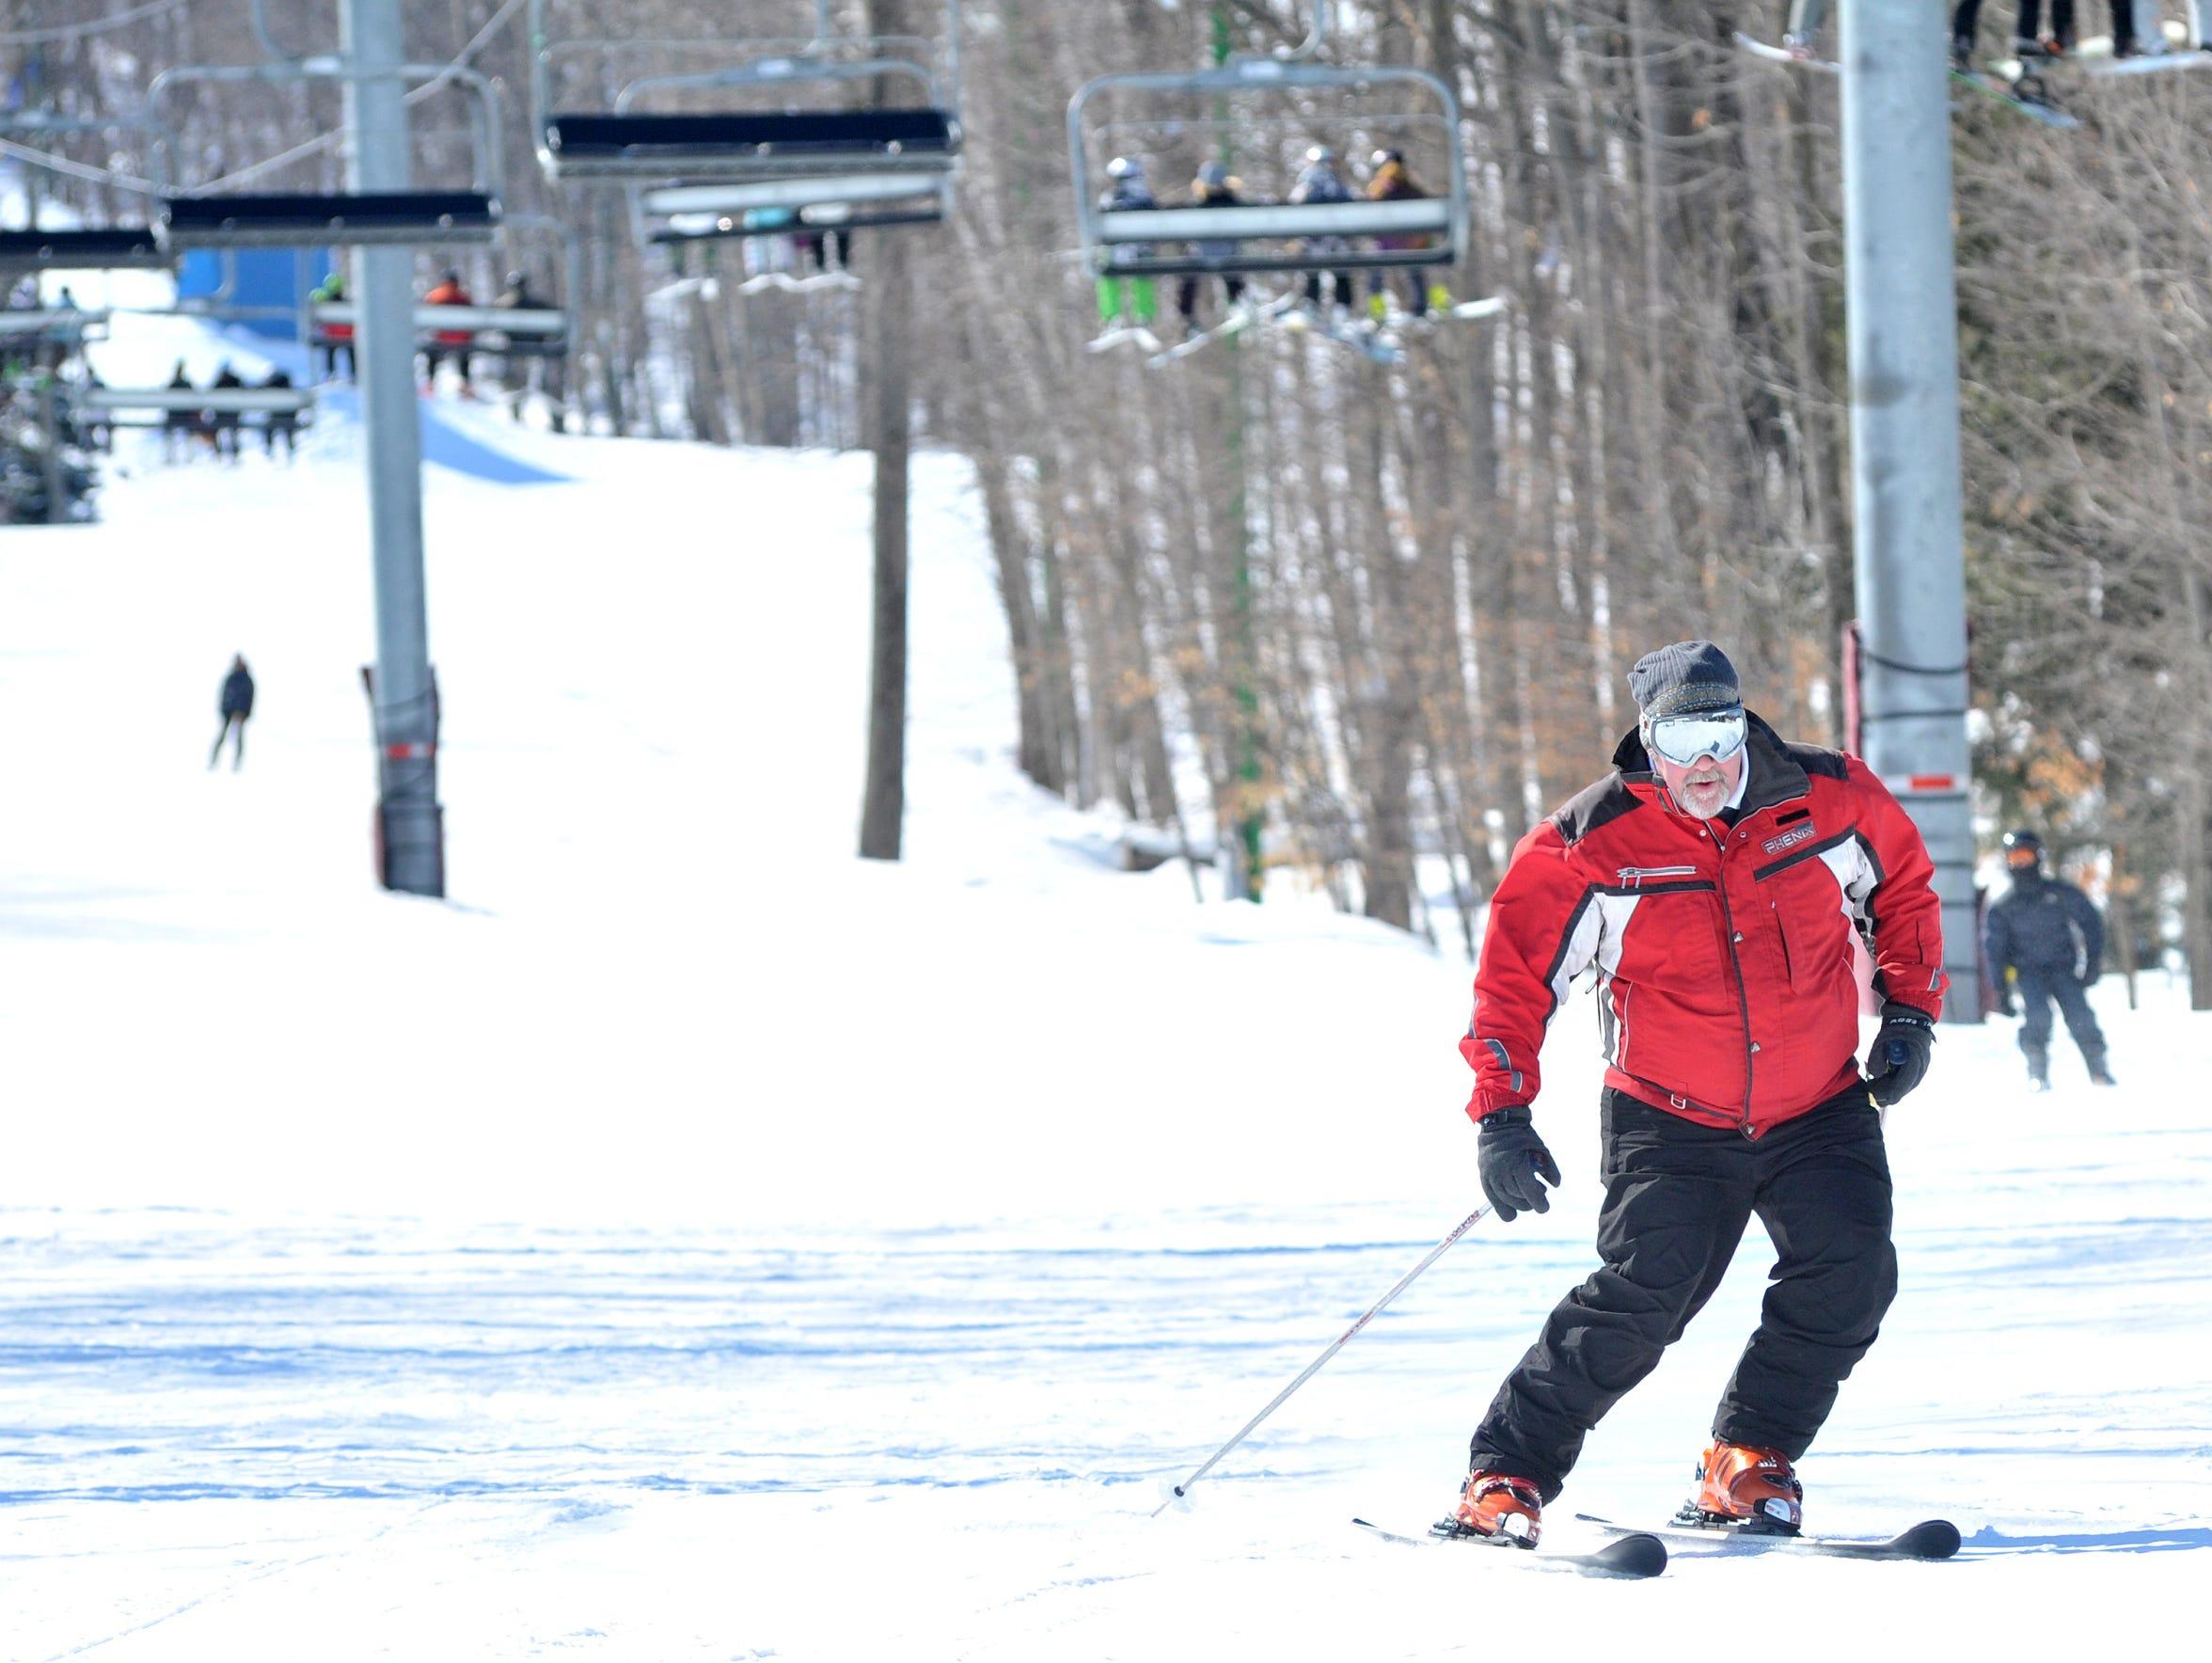 Granite Peak Ski Area has applied for a permit to build